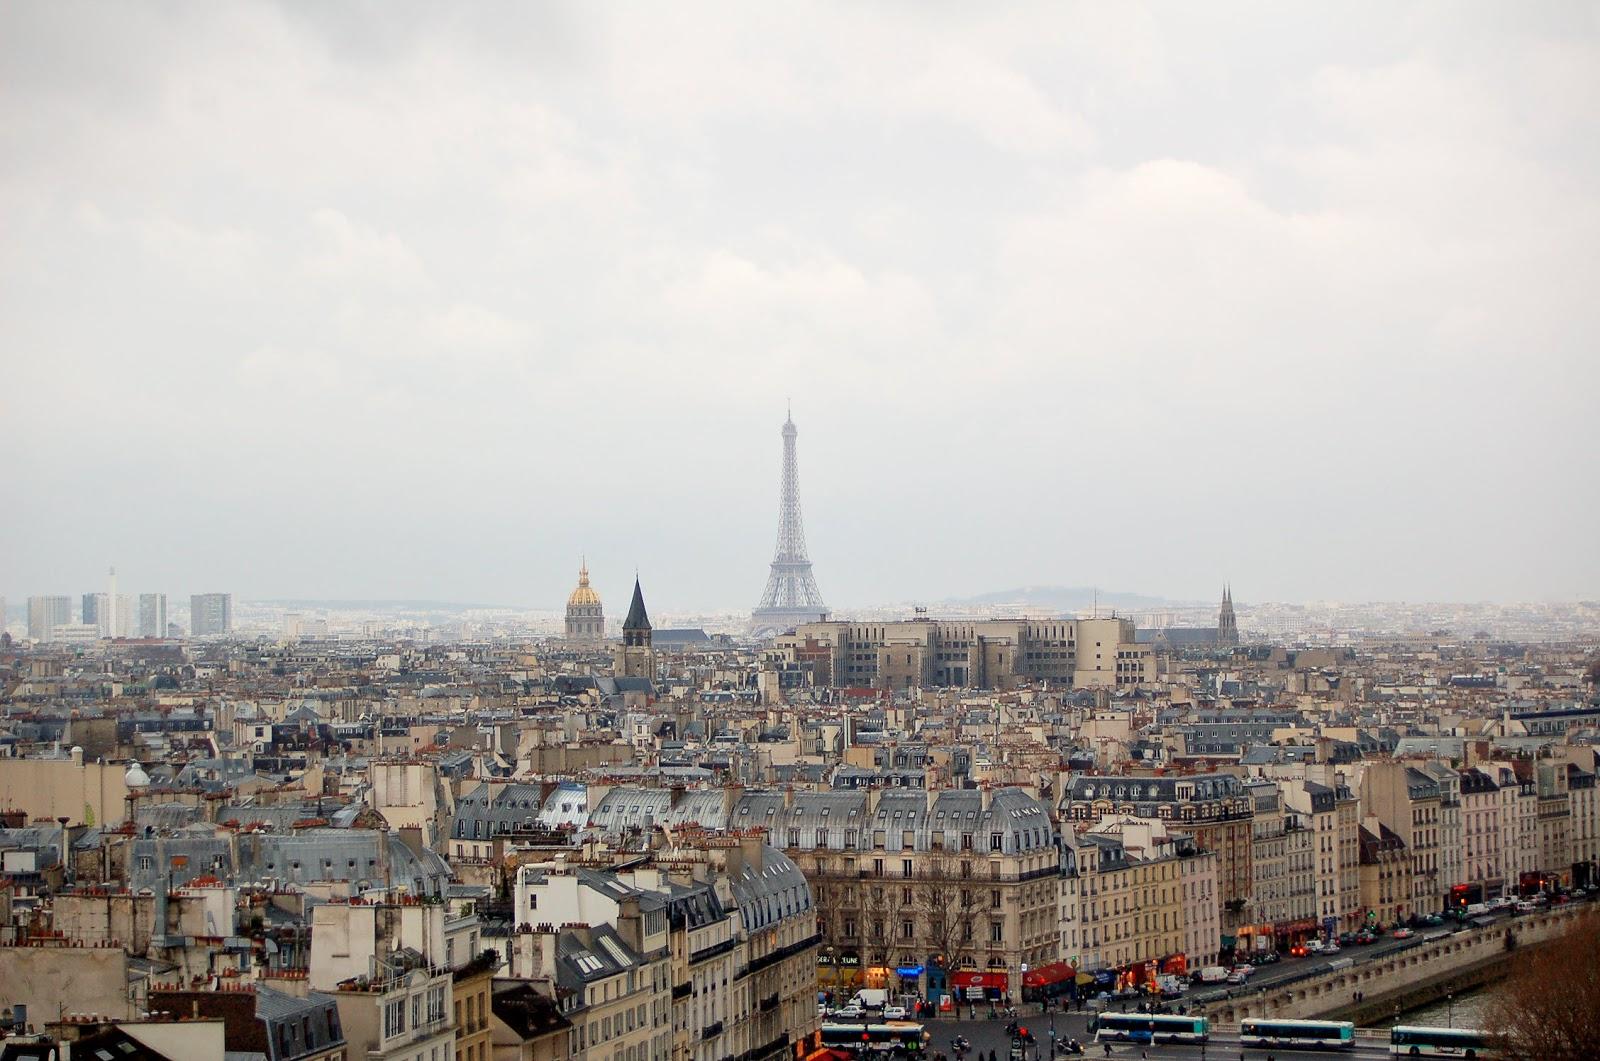 http://2.bp.blogspot.com/-ILSjyhM4UUc/T1LGwVkMmFI/AAAAAAAAB3M/vDvlrC7ixEE/s1600/Paris+%2877%29.jpg